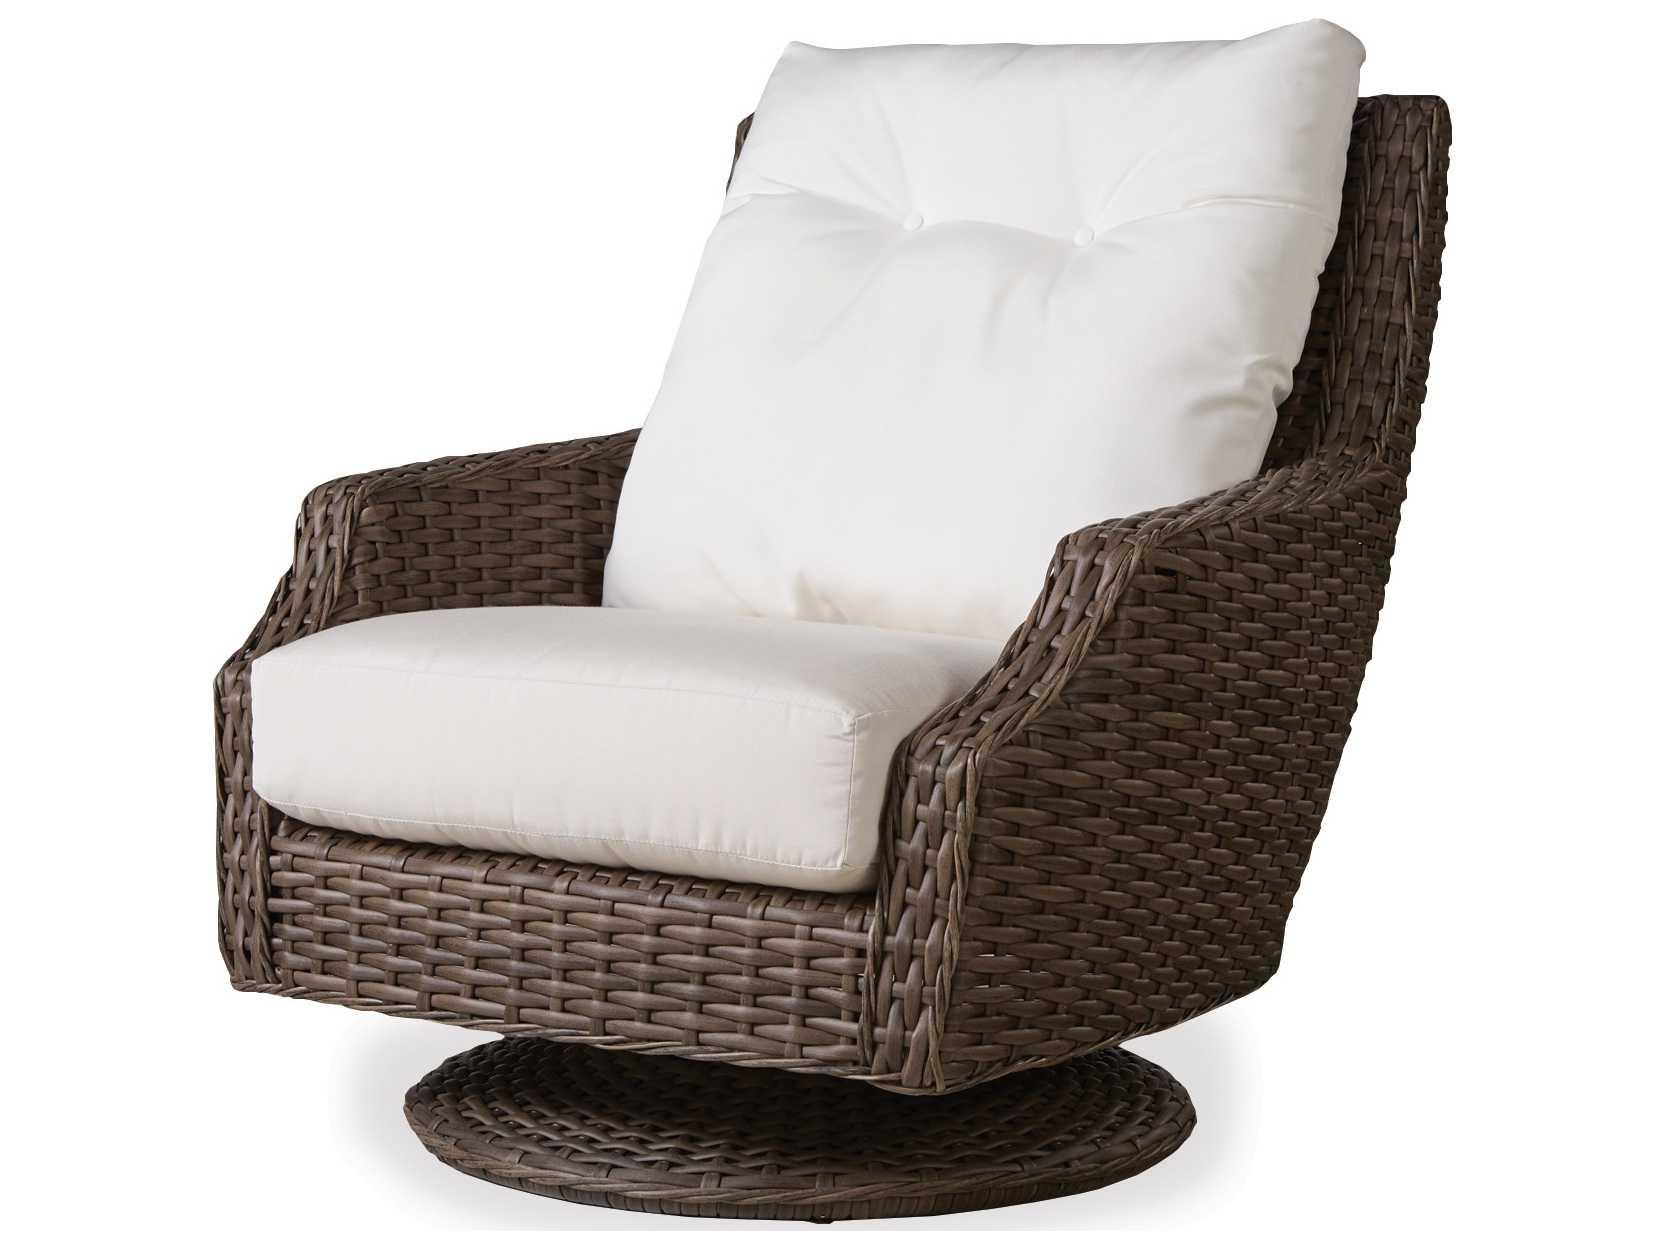 high back outdoor chair cushion covers best gamer lloyd flanders largo wicker swivel rocker | 241080